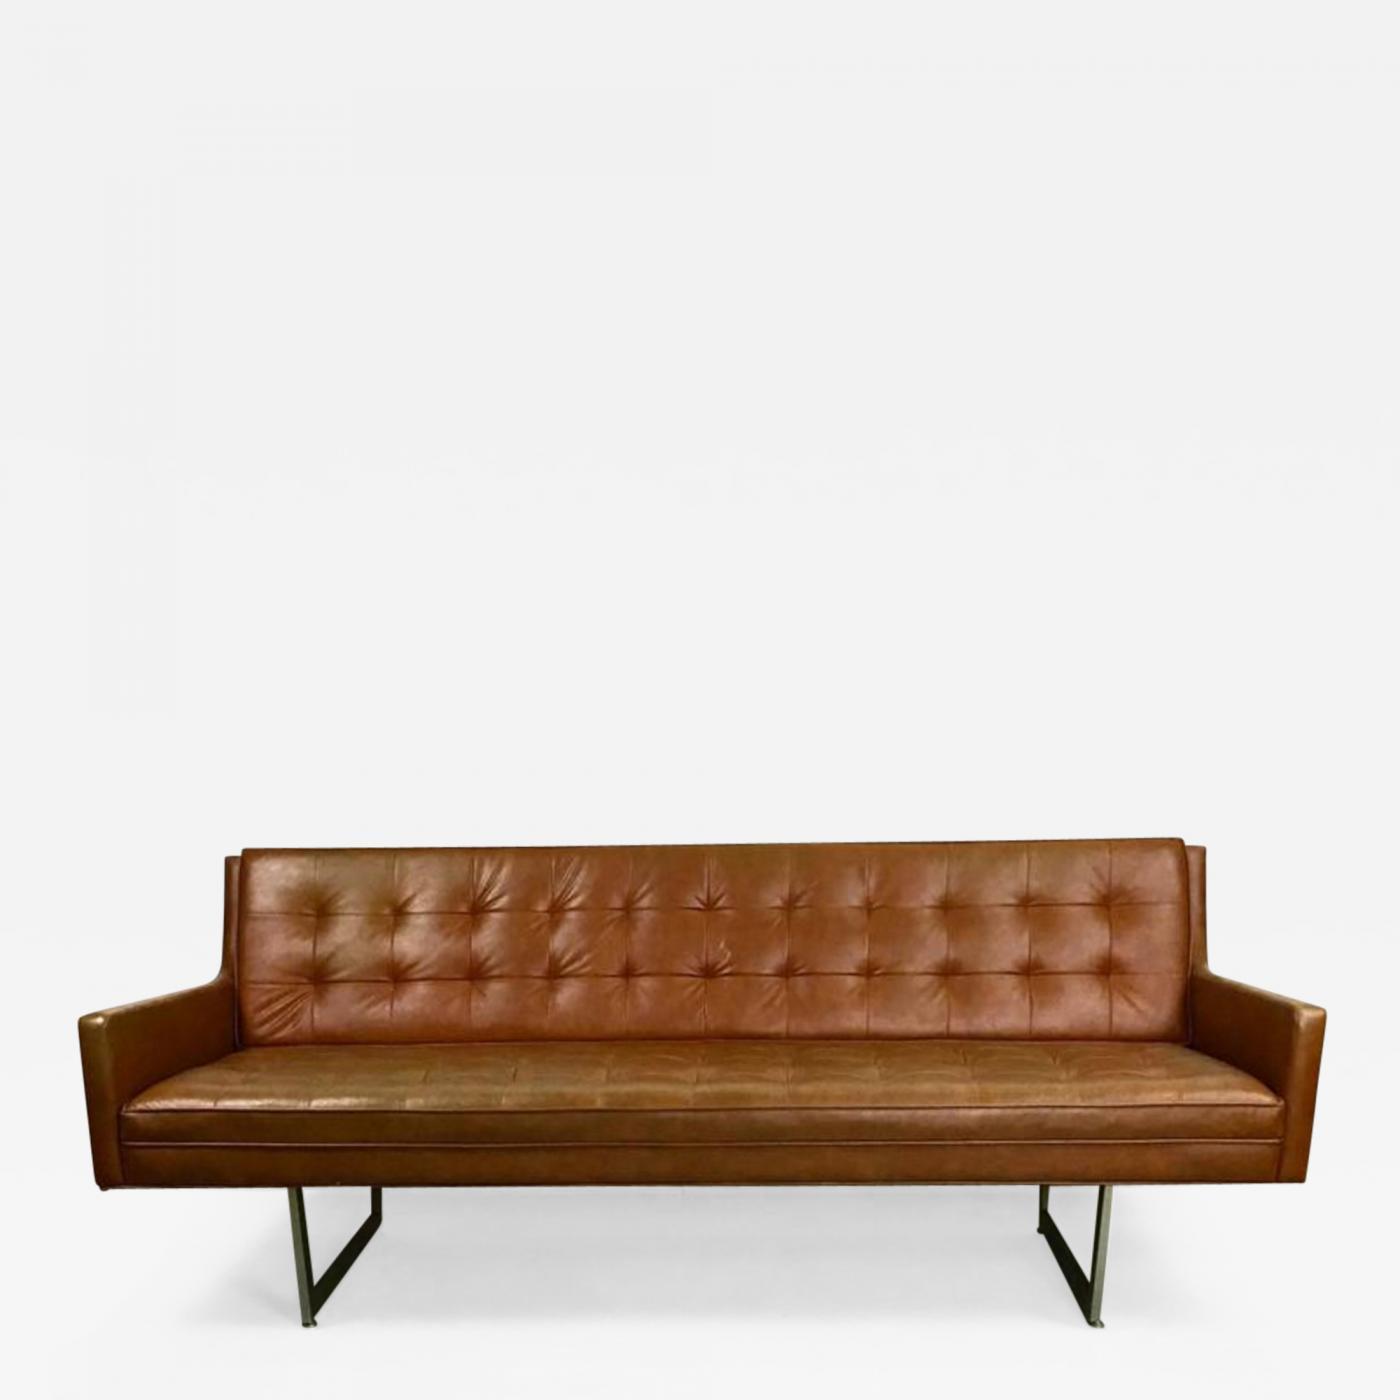 Superbe Listings / Furniture / Seating / Sofas